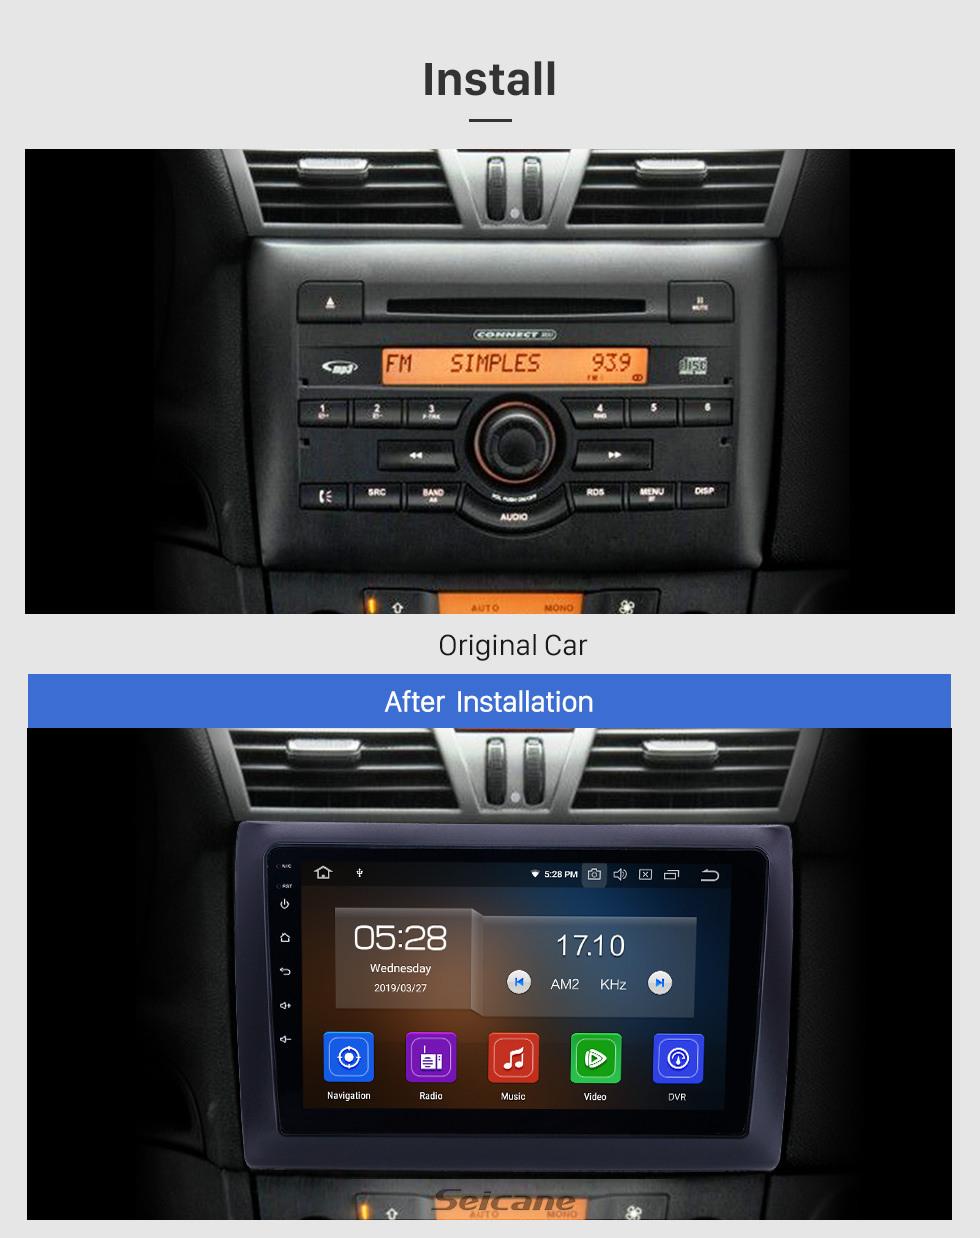 Seicane 9 inch Android 10.0 Radio for 2010 Fiat Stilo Bluetooth WIFI USB HD Touchscreen GPS Navigation Carplay support OBD2 TPMS DAB+ DVR